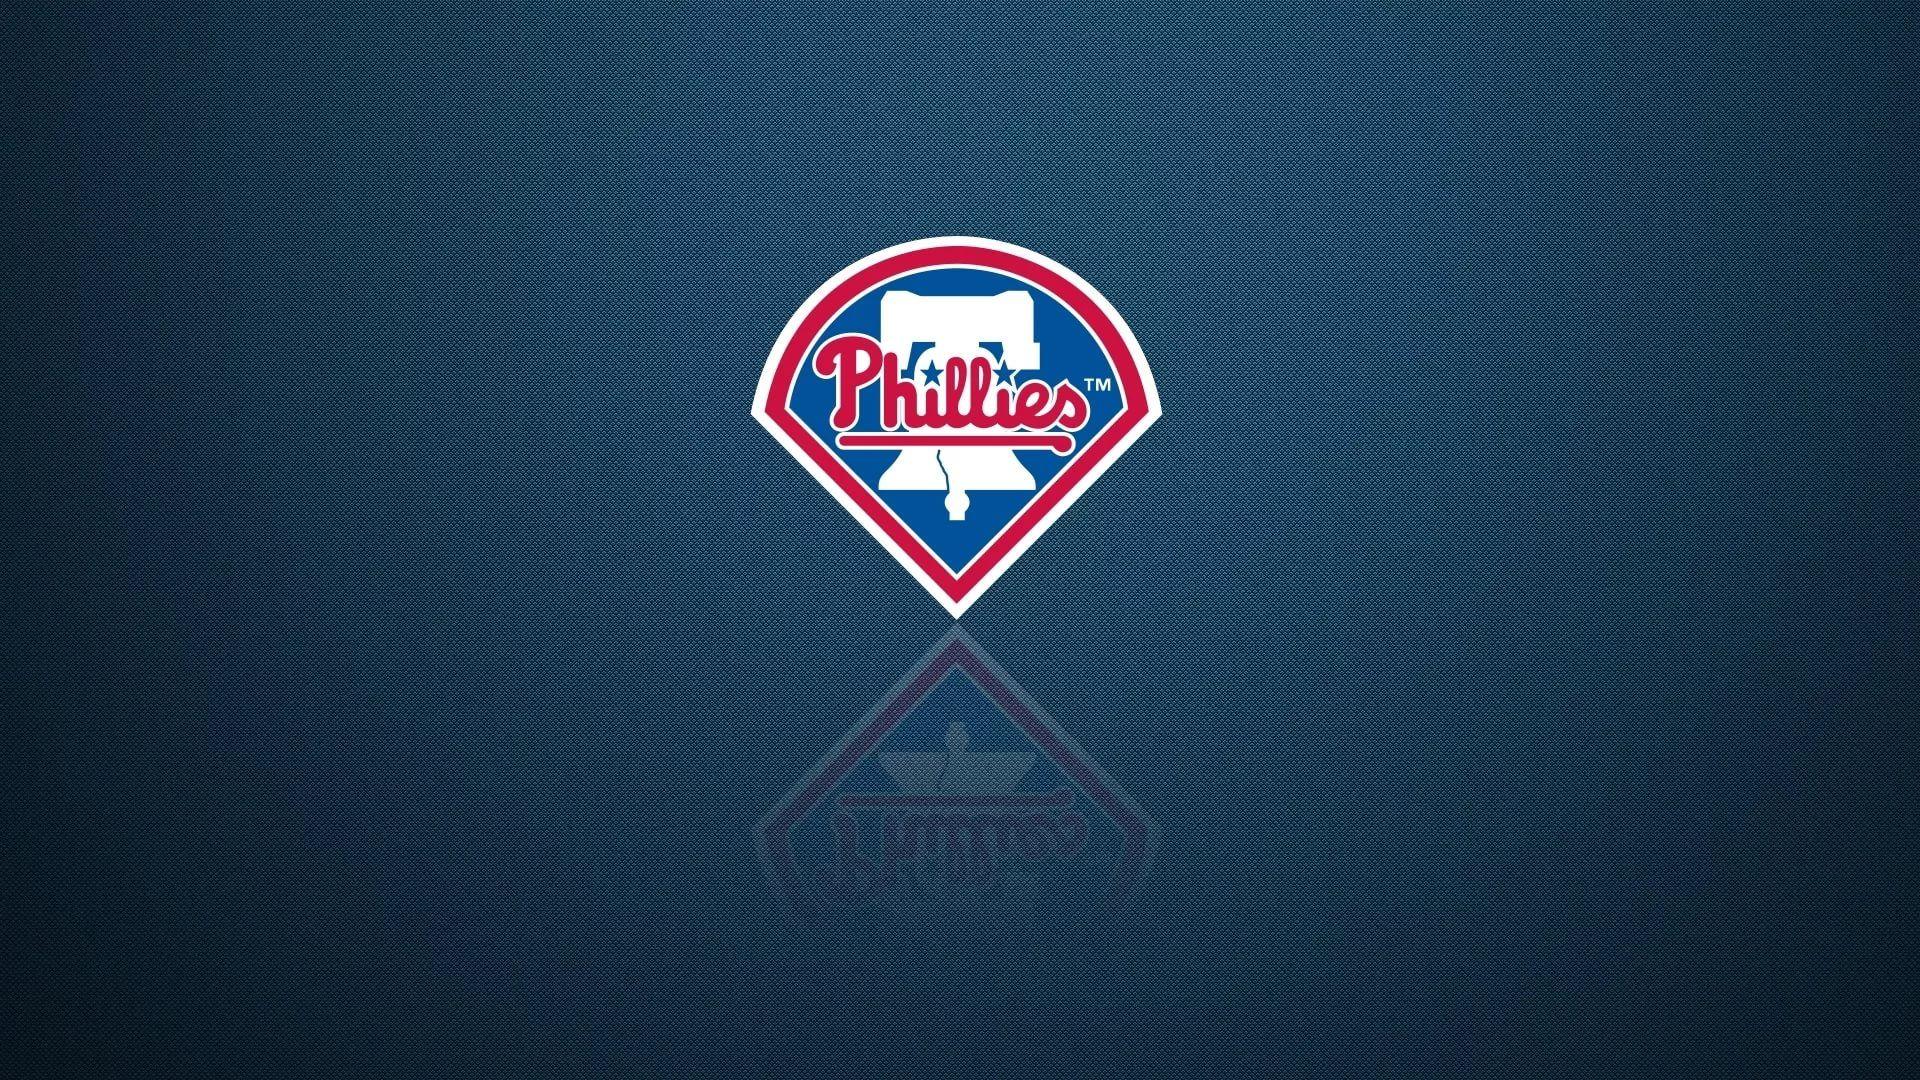 Phillies Logo hd wallpaper download